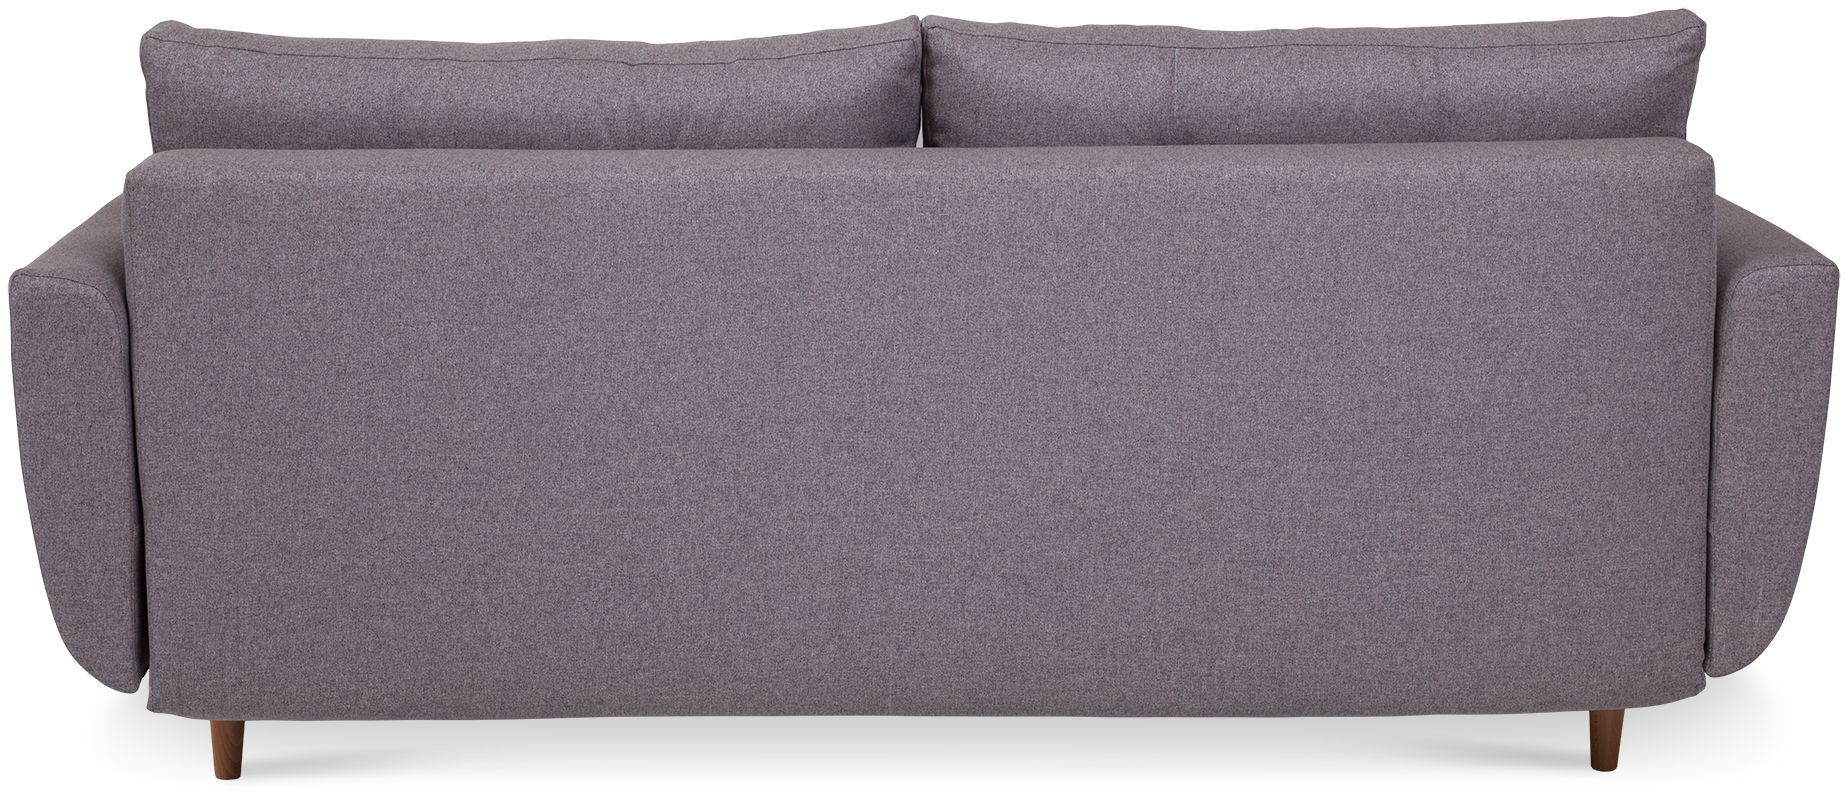 sofa diora 10